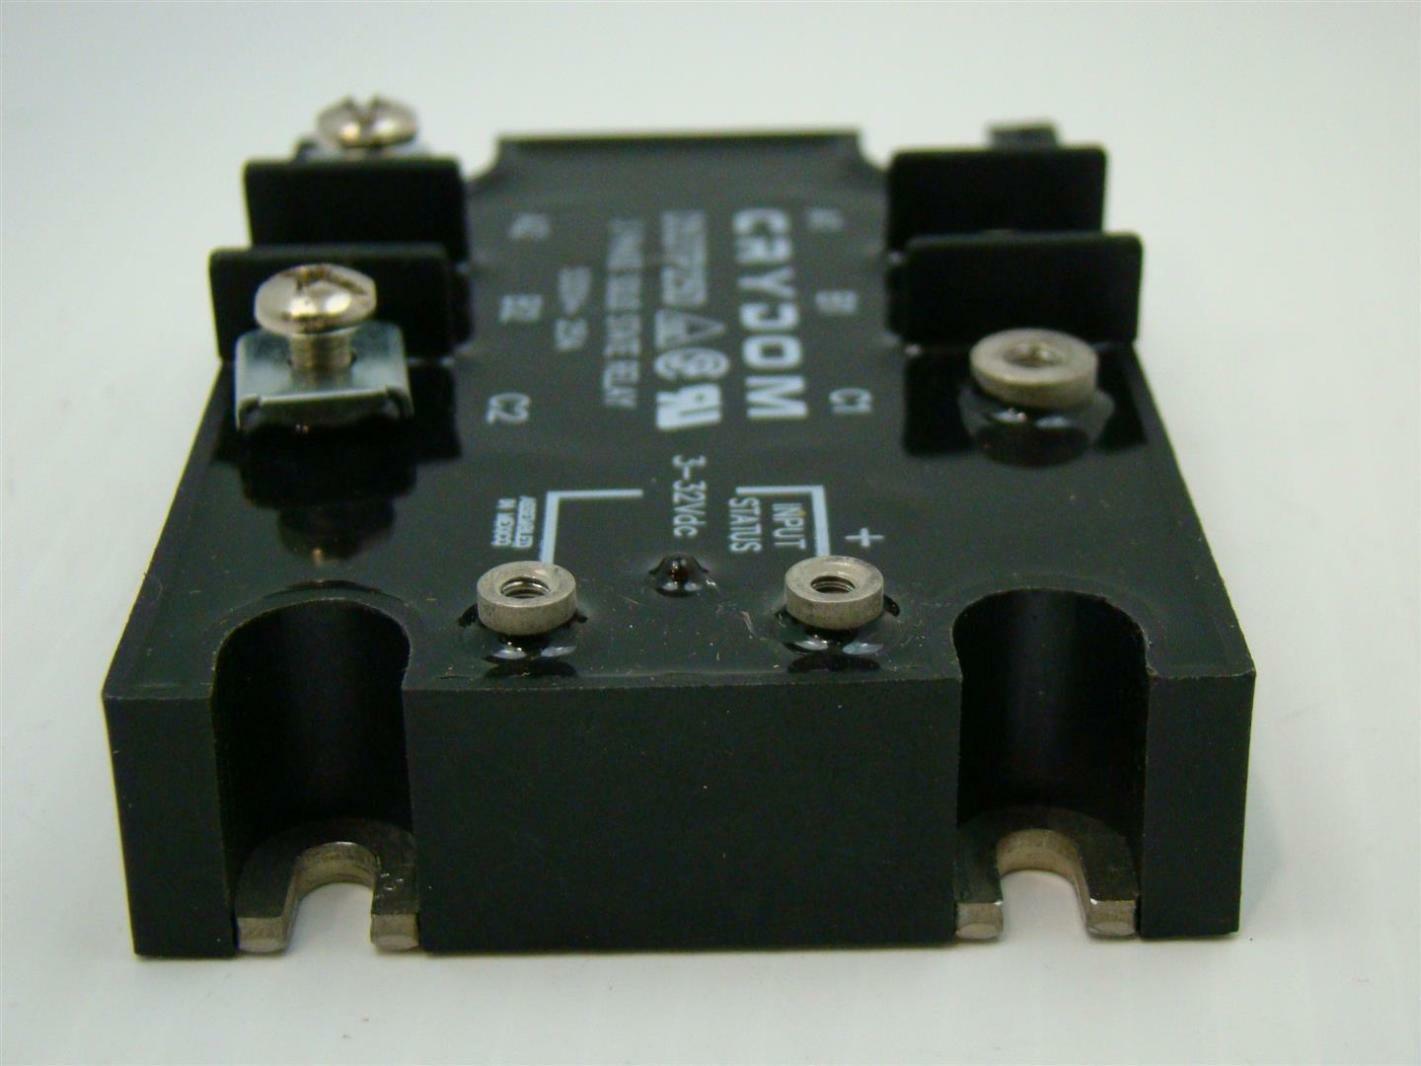 Crydom Solid State Relay SSR 3PH 25A 530V 332vdc Coil D53TP25D eBay